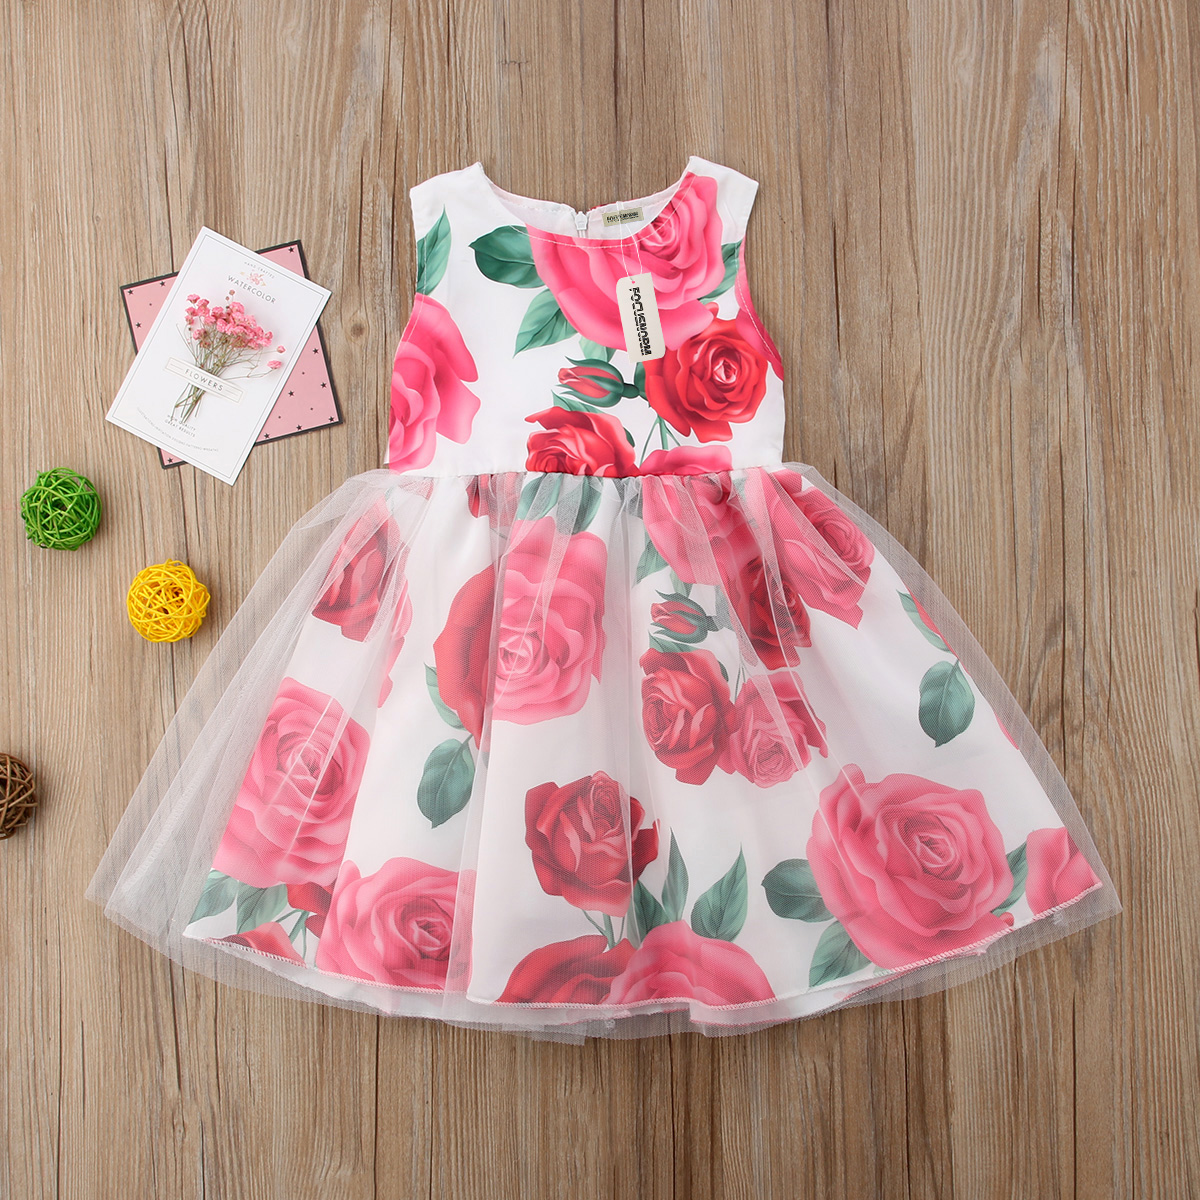 631cdfb3b80a Toddler Kids Baby Girls Flower Sundress Princess Party Tulle Tutu ...